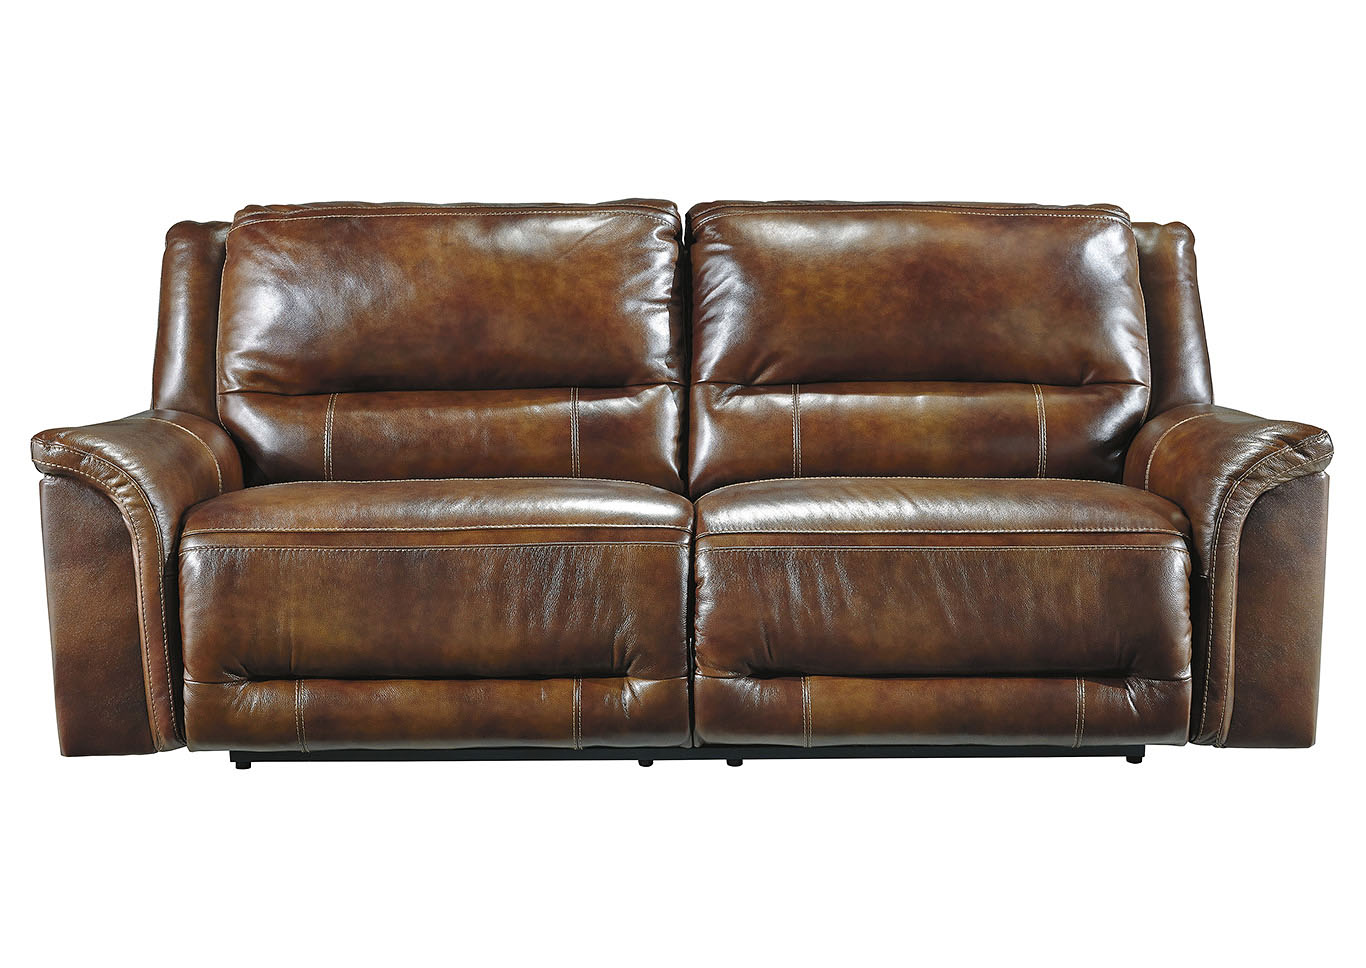 Lovely Jayron Harness 2 Seat Reclining Power Sofa,Benchcraft